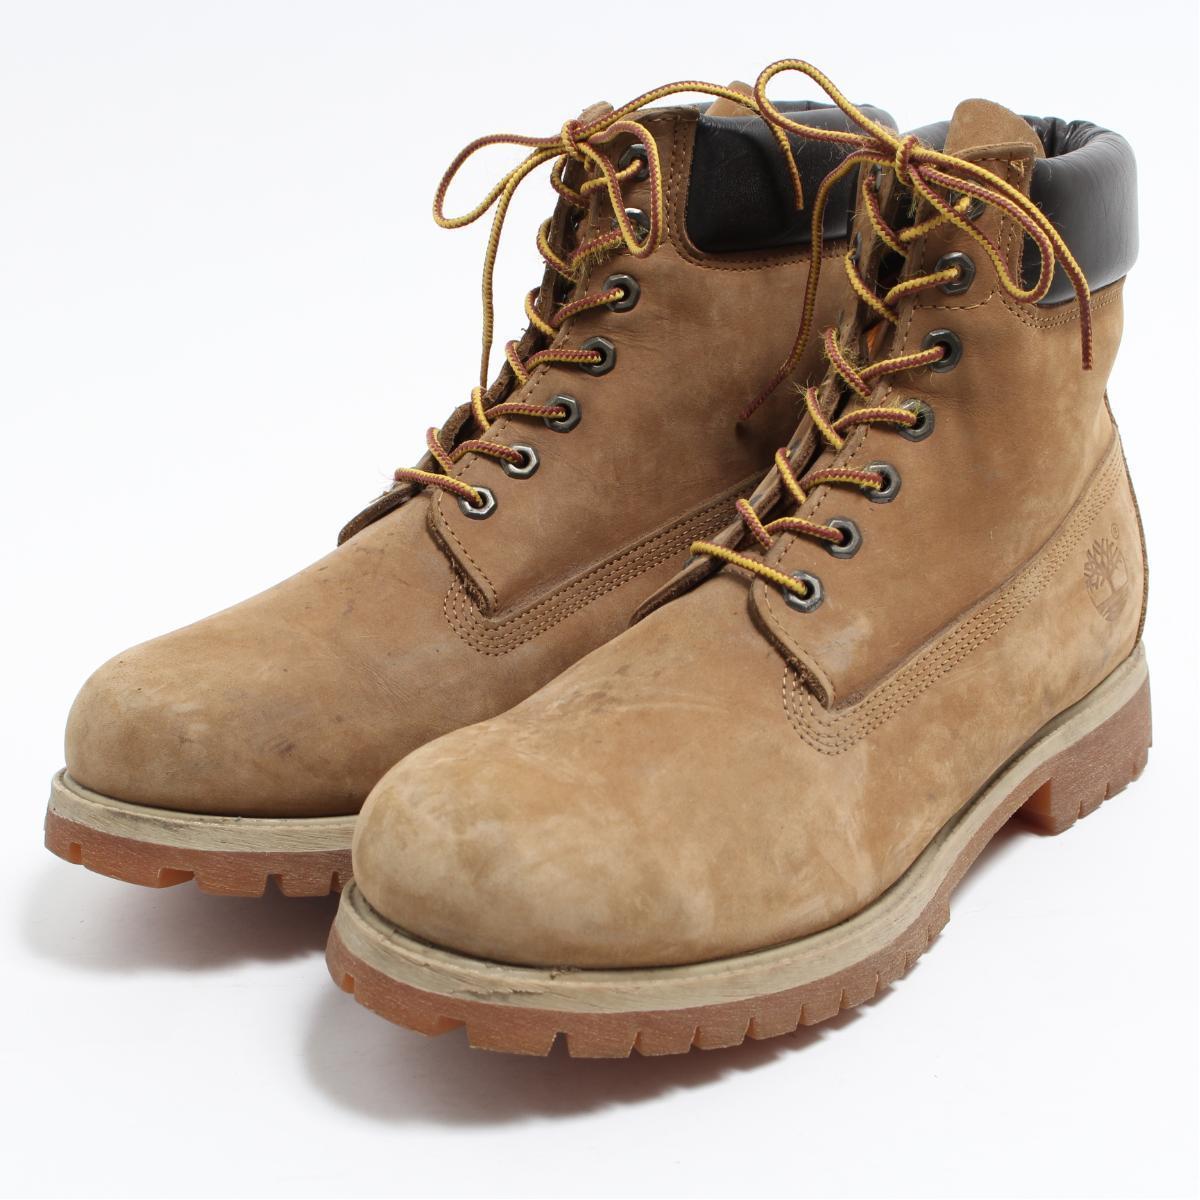 camino Correctamente recomendar  VINTAGE CLOTHING JAM: 115M men 29.5cm /boo7425 made in Timberland ...